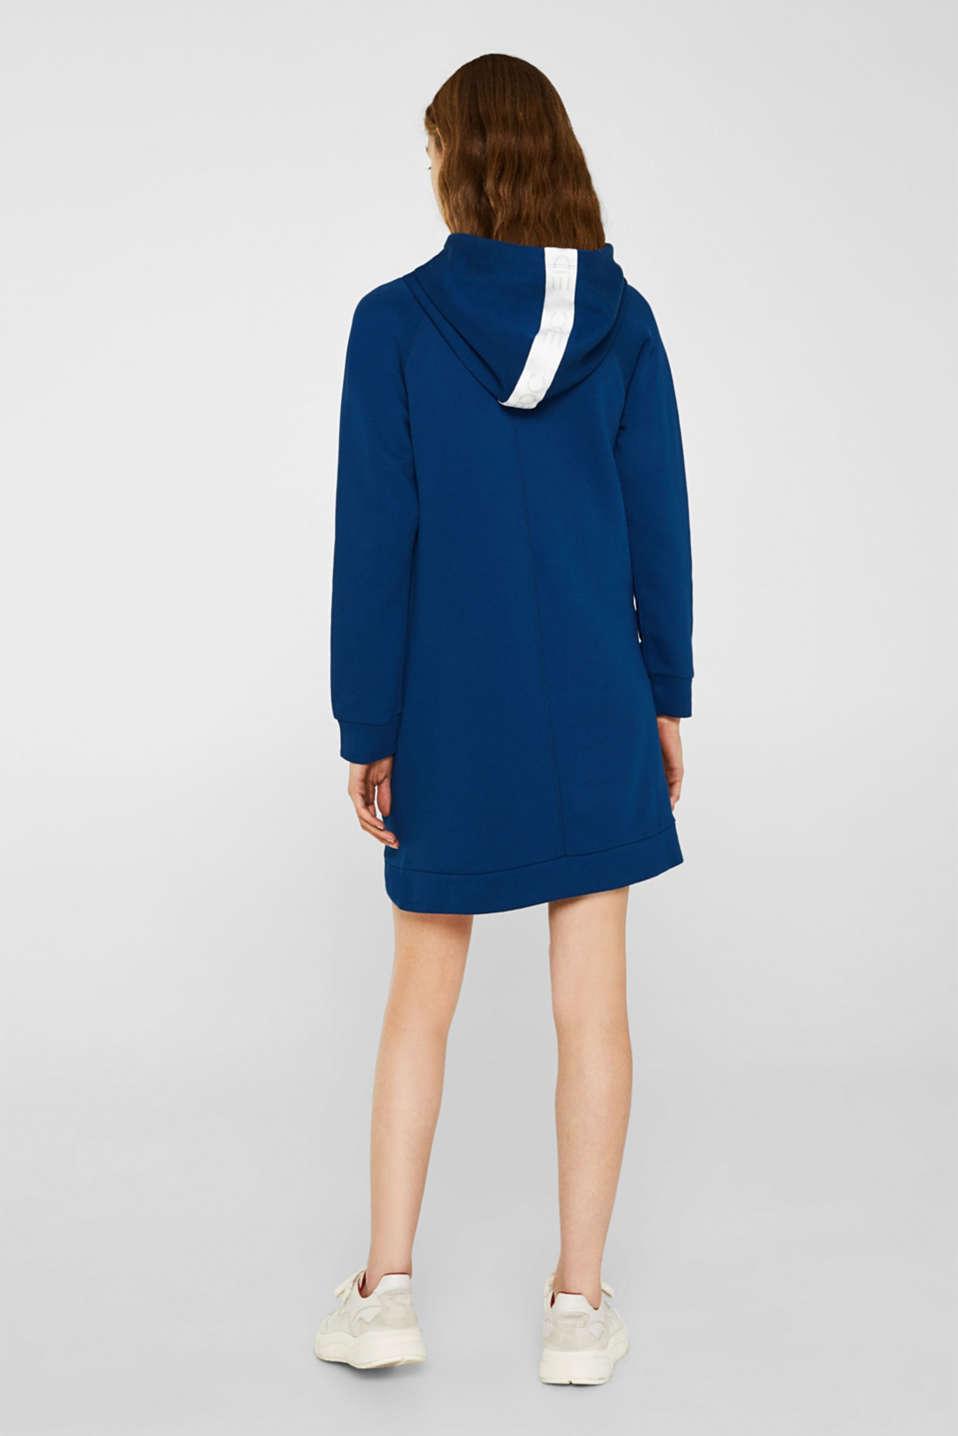 Dresses knitted, DARK BLUE, detail image number 2